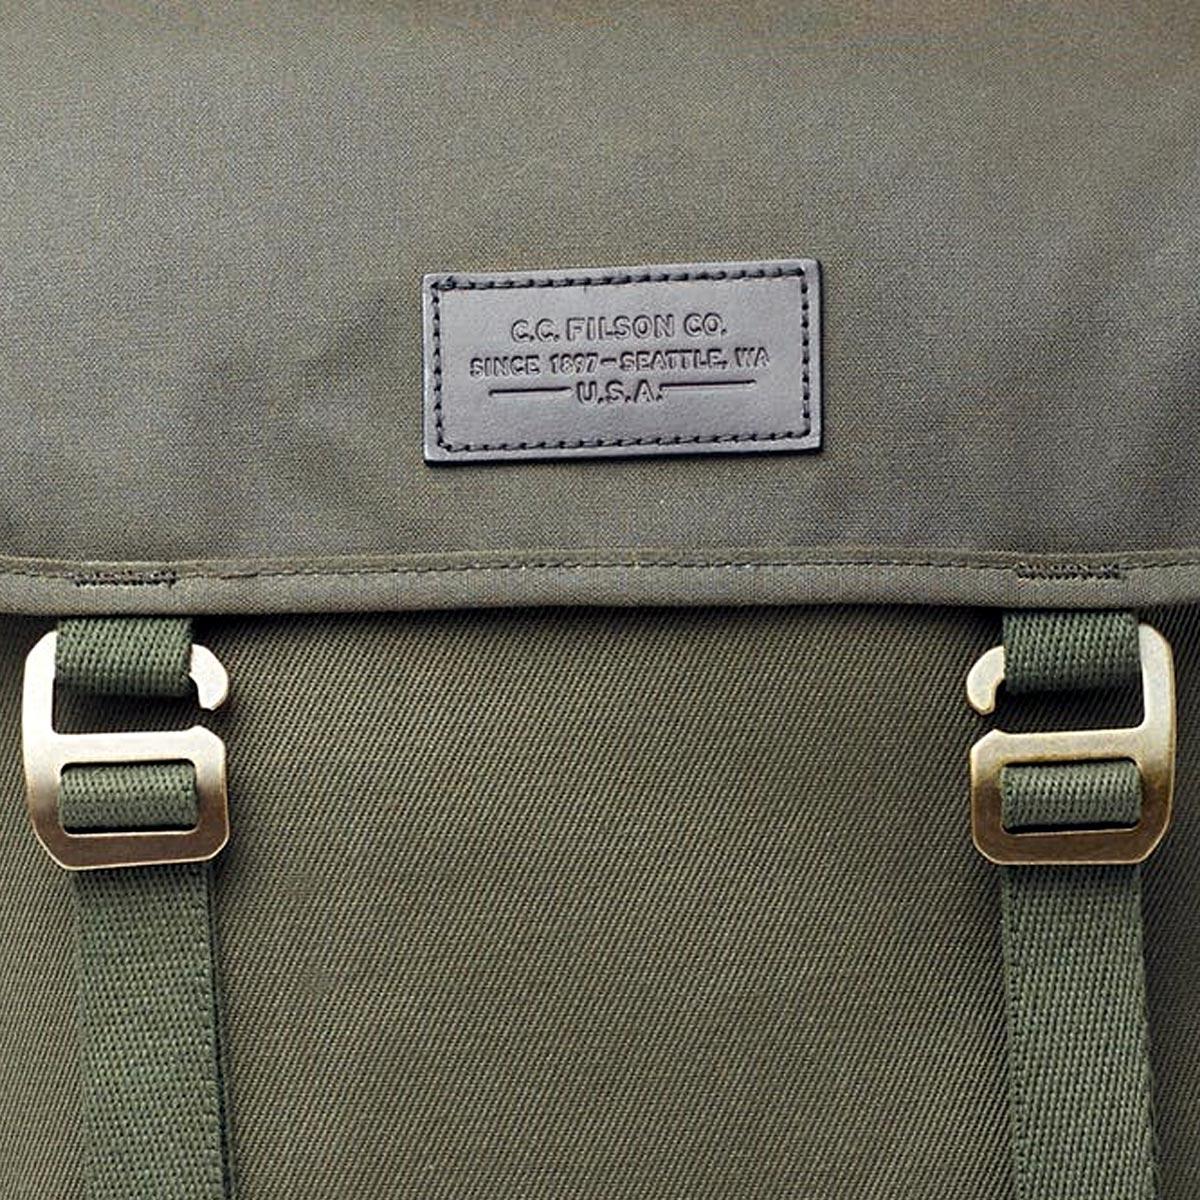 Filson Ranger Backpack 20137828 Otter Green extraordinary bag for an ordinary day